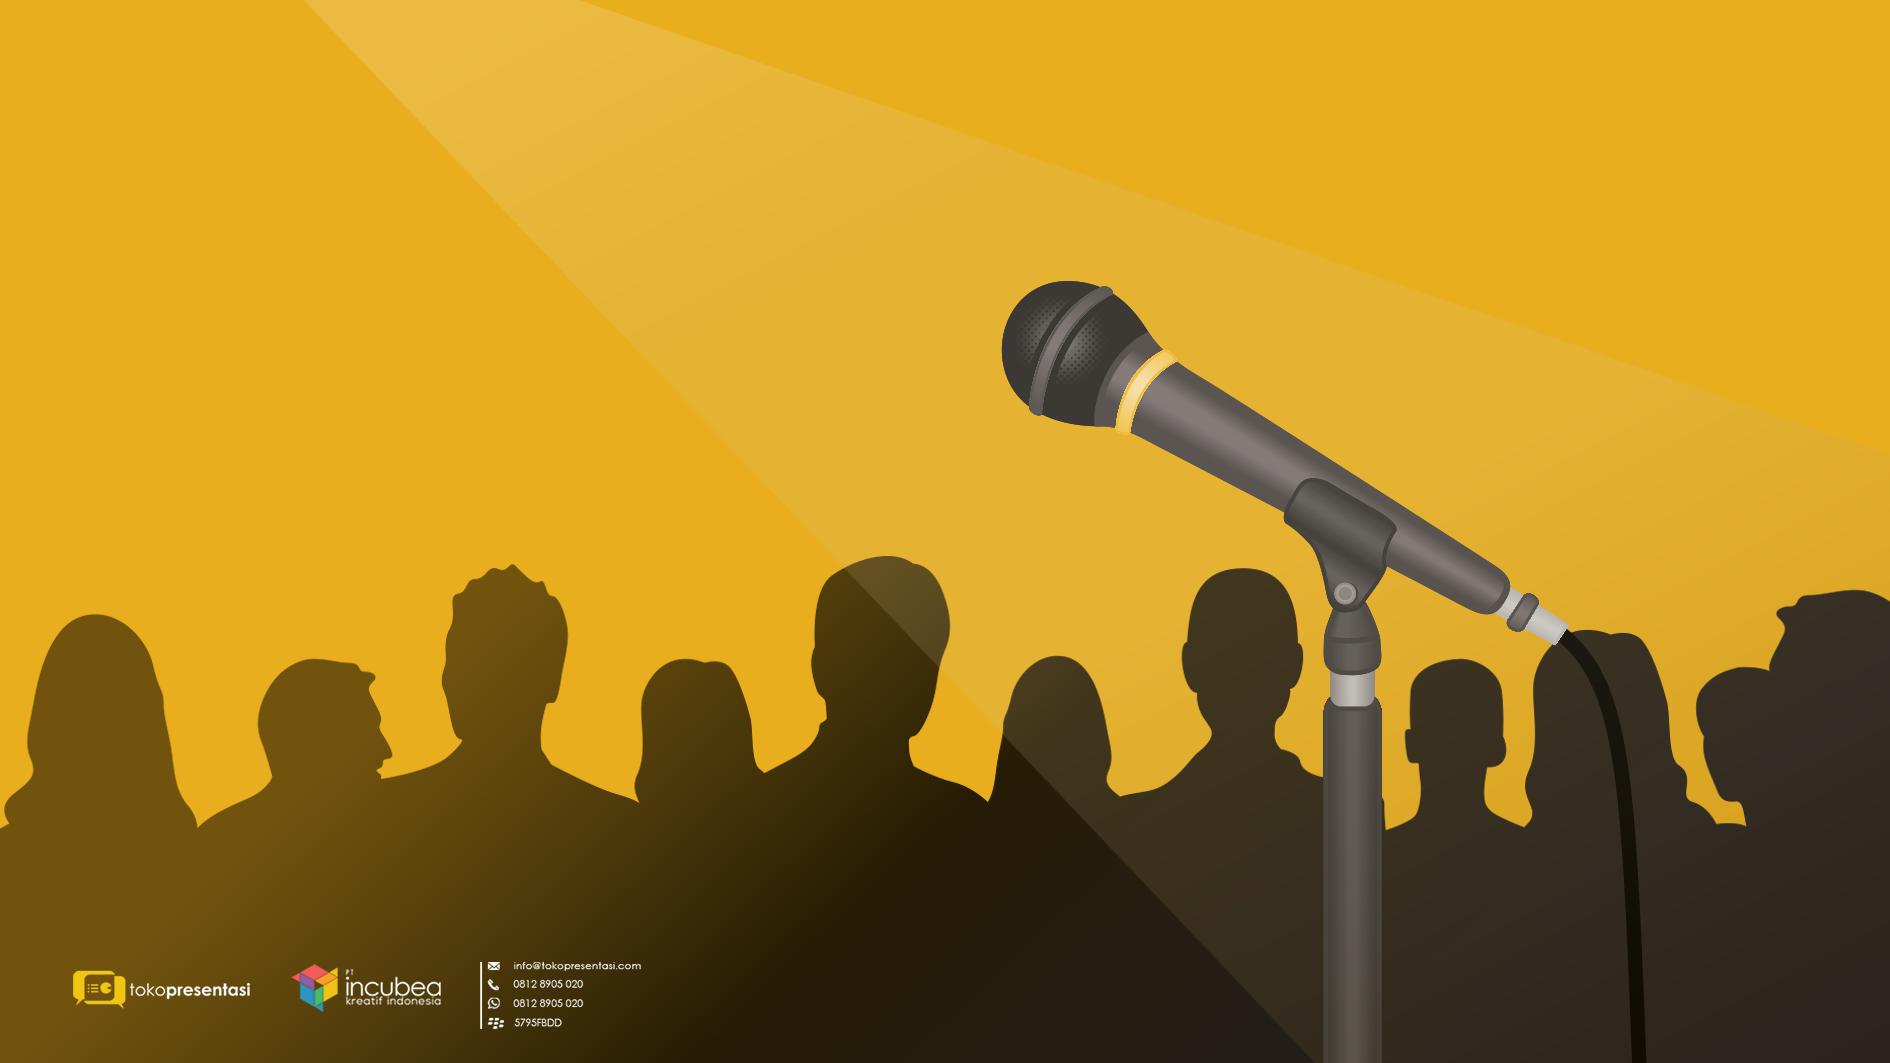 Jasa Pembuatan Presentasi Powerpoint Lawyer - Tokopresentasi